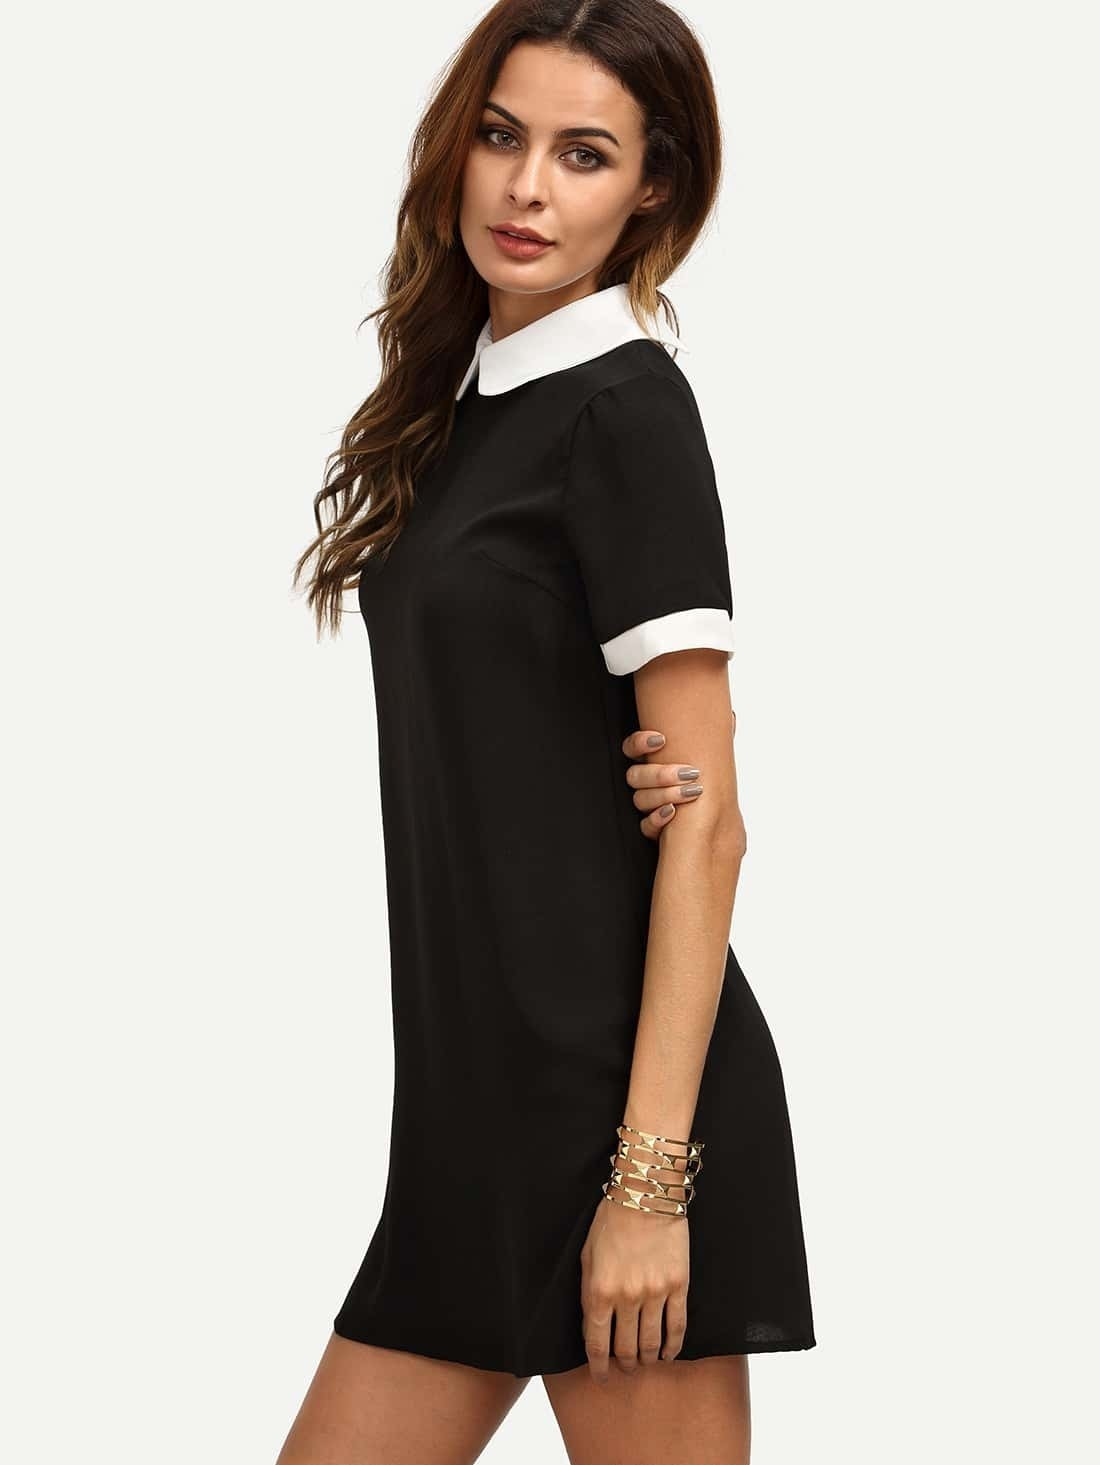 black peter pan collar short sleeve shift dress emmacloth women fast fashion online. Black Bedroom Furniture Sets. Home Design Ideas